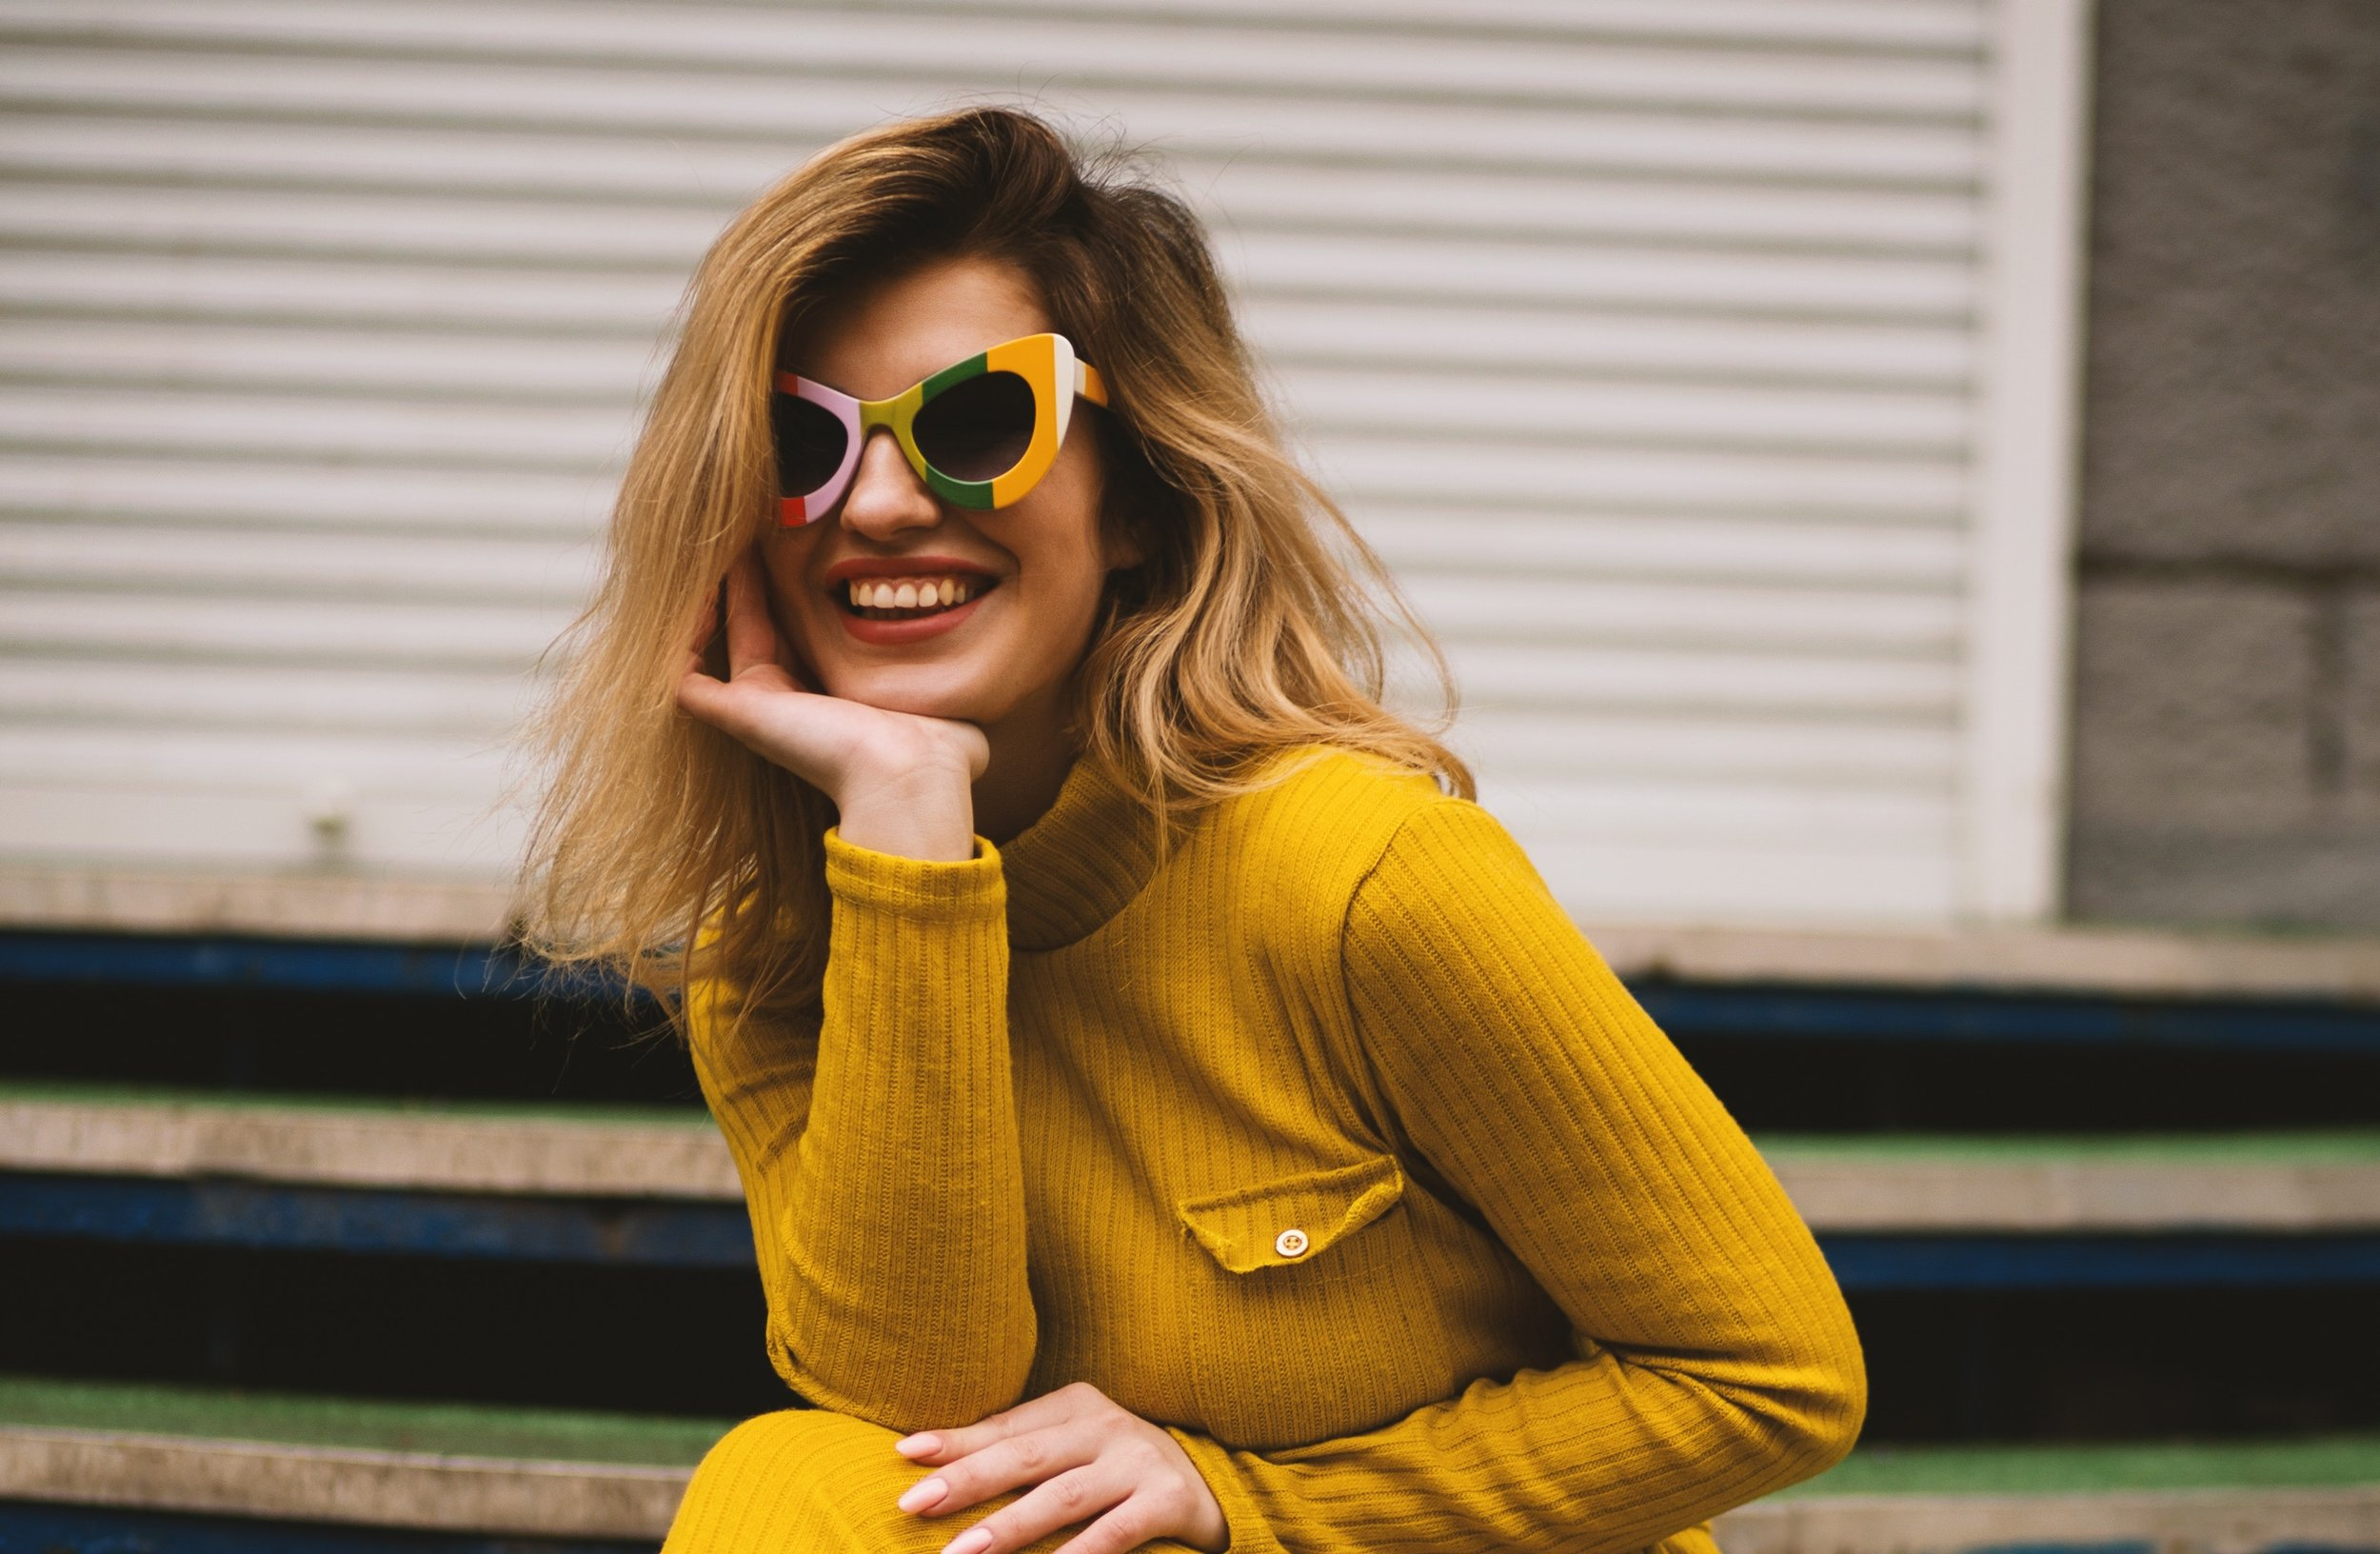 style confidence brighton girl